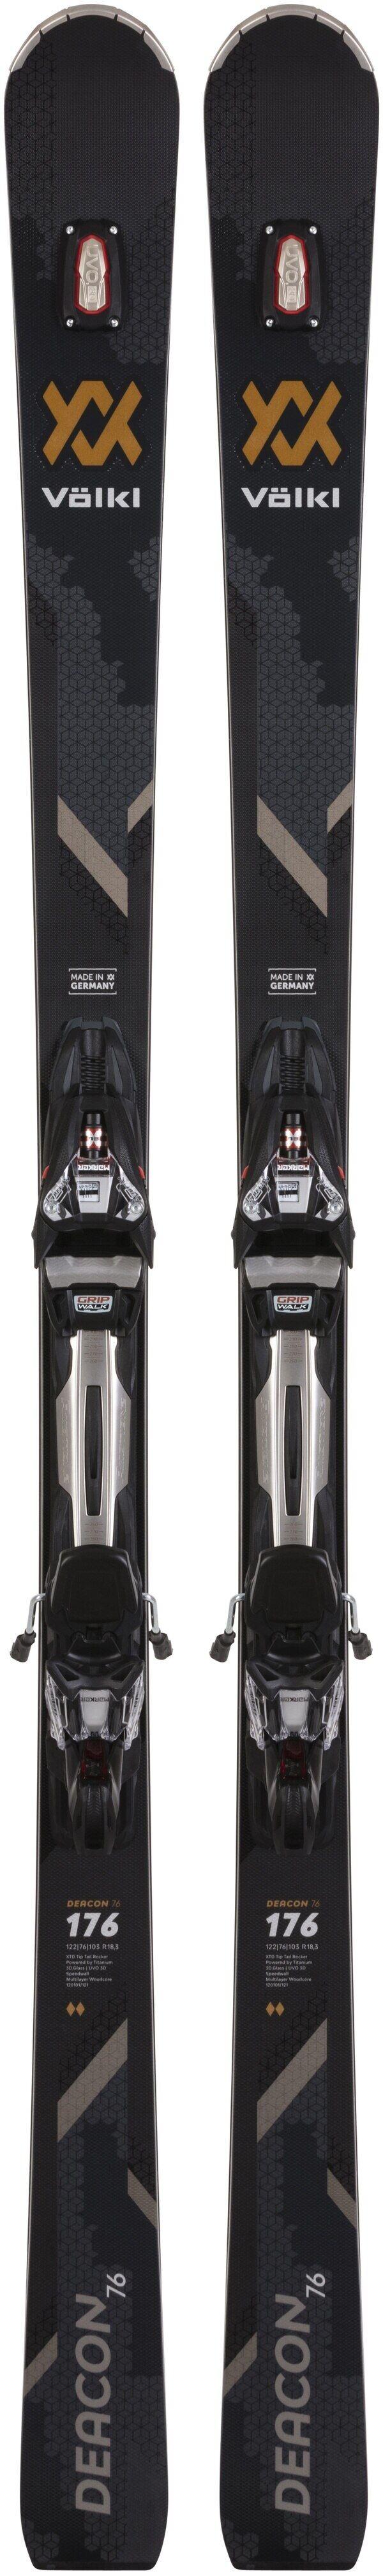 2021 Volkl Deacon 76 Skis w// rMotion2 12 GW Bindings